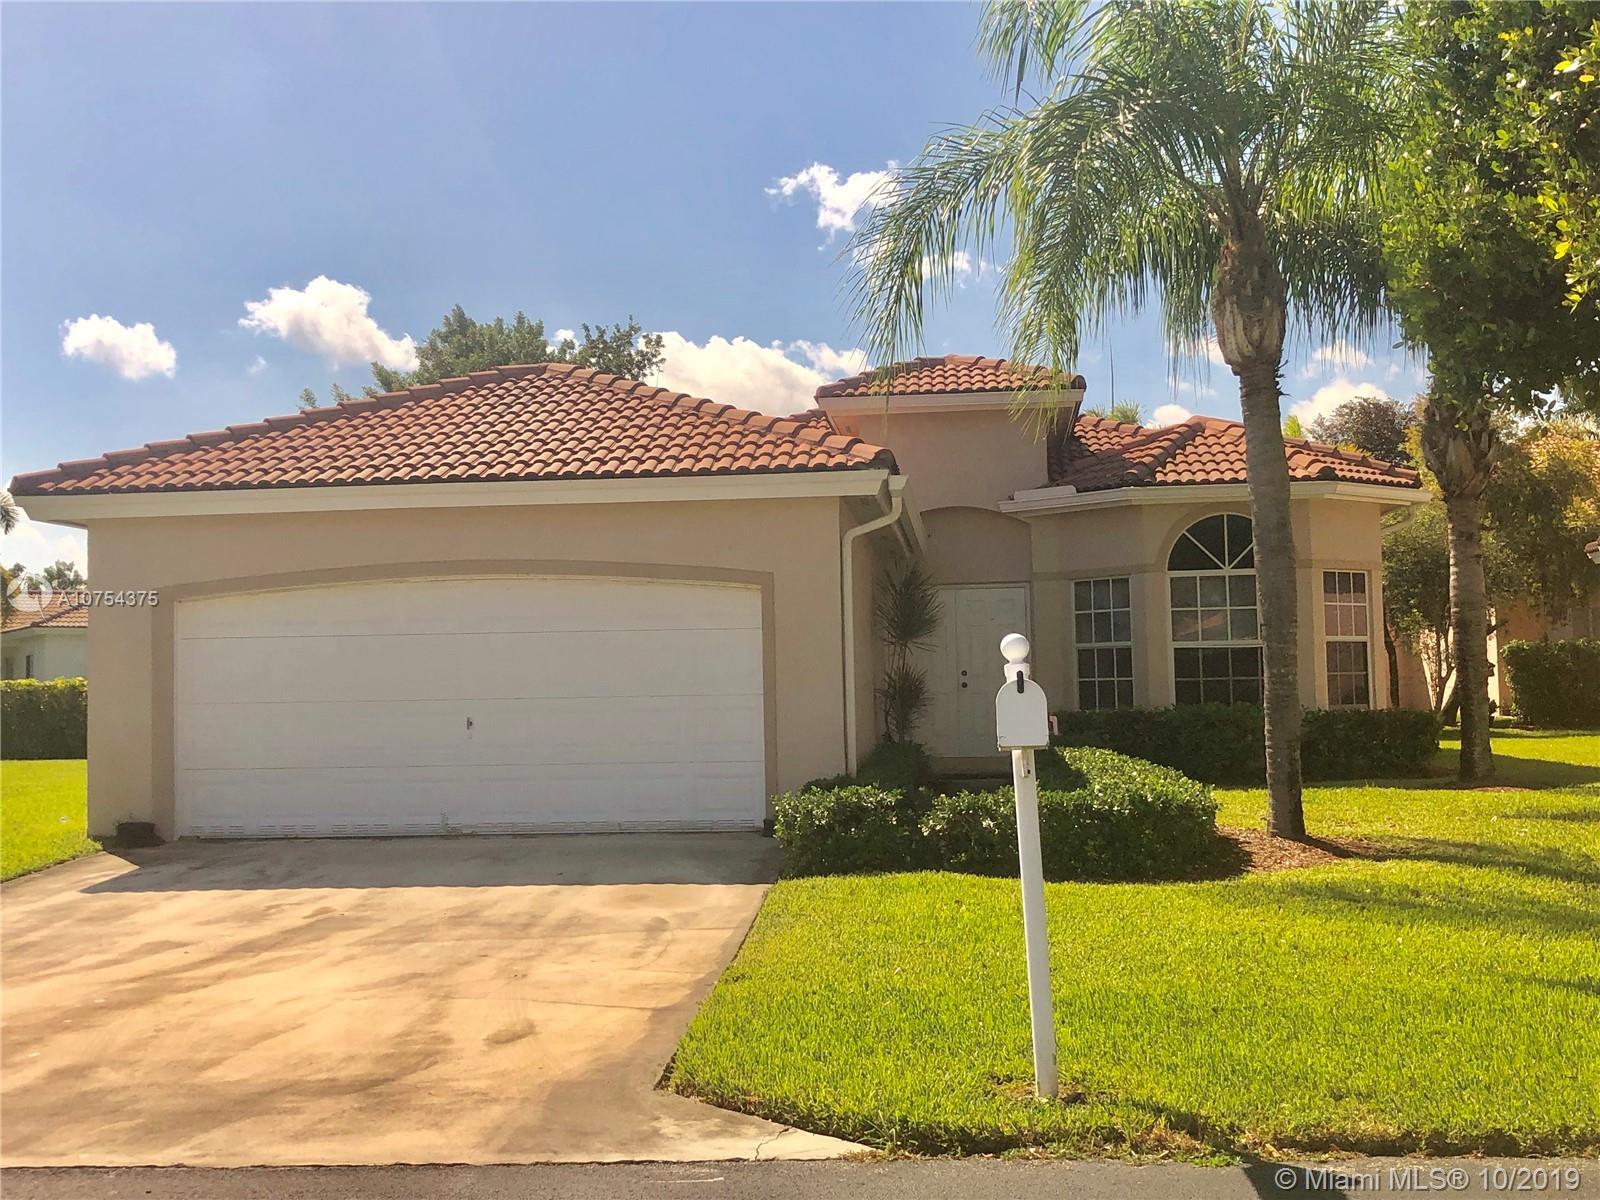 2455 5 CT, Homestead, FL 33033 - Homestead, FL real estate listing